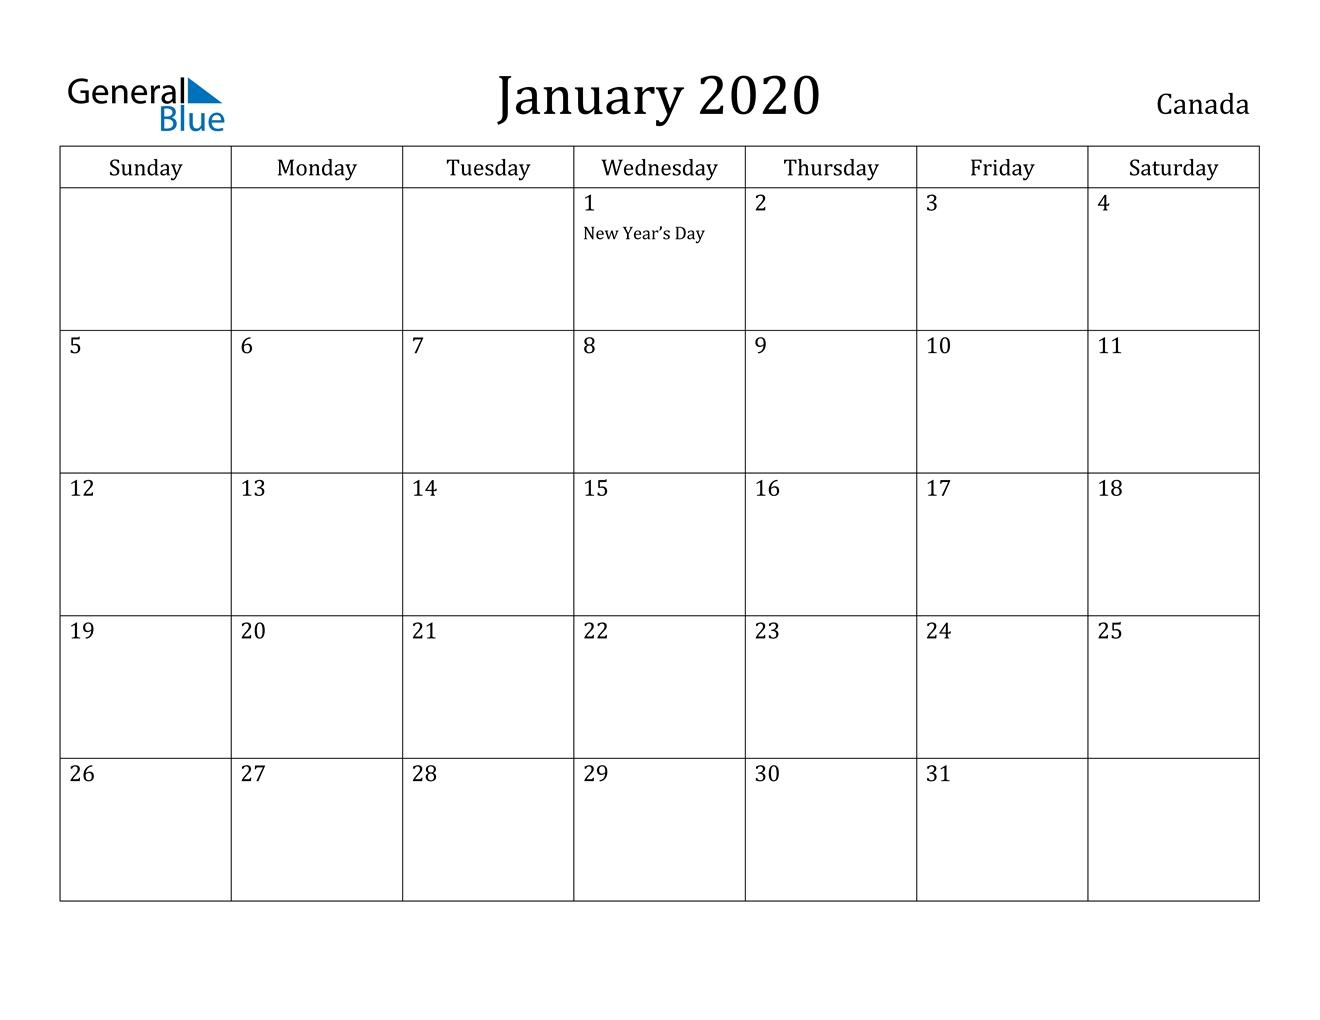 January 2020 Calendar - Canada  Monthly Calendar 2020